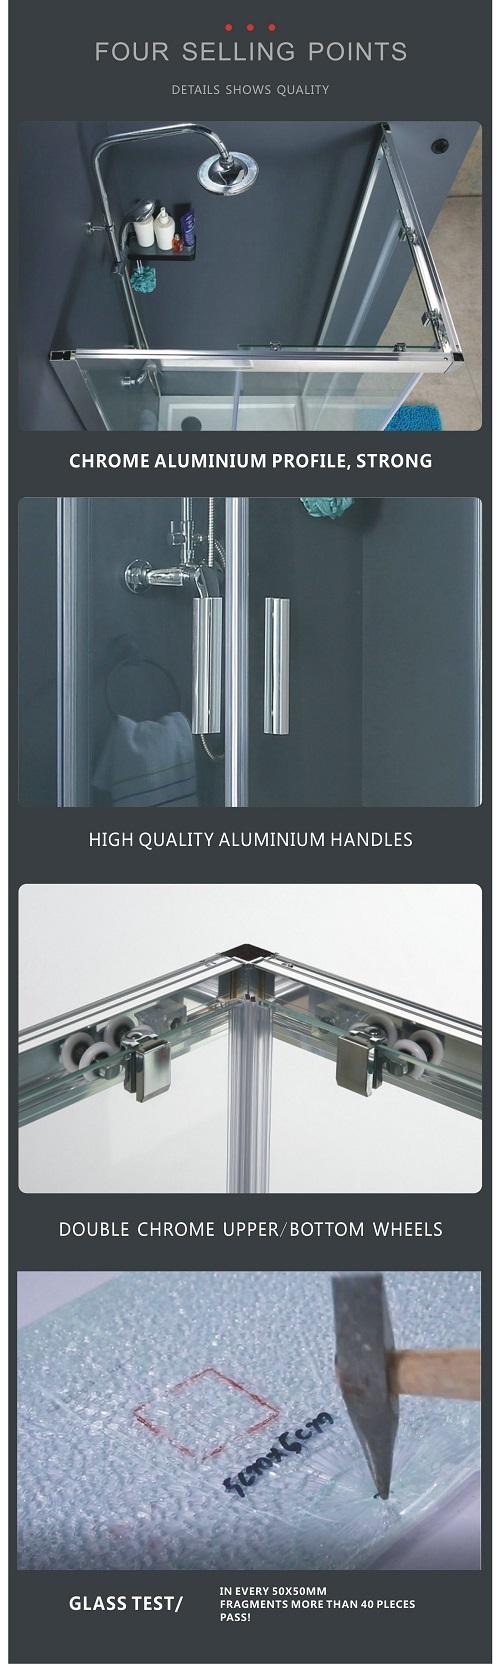 Chrome aluminium bath Shower enclosure with 6 mm tepmered glass